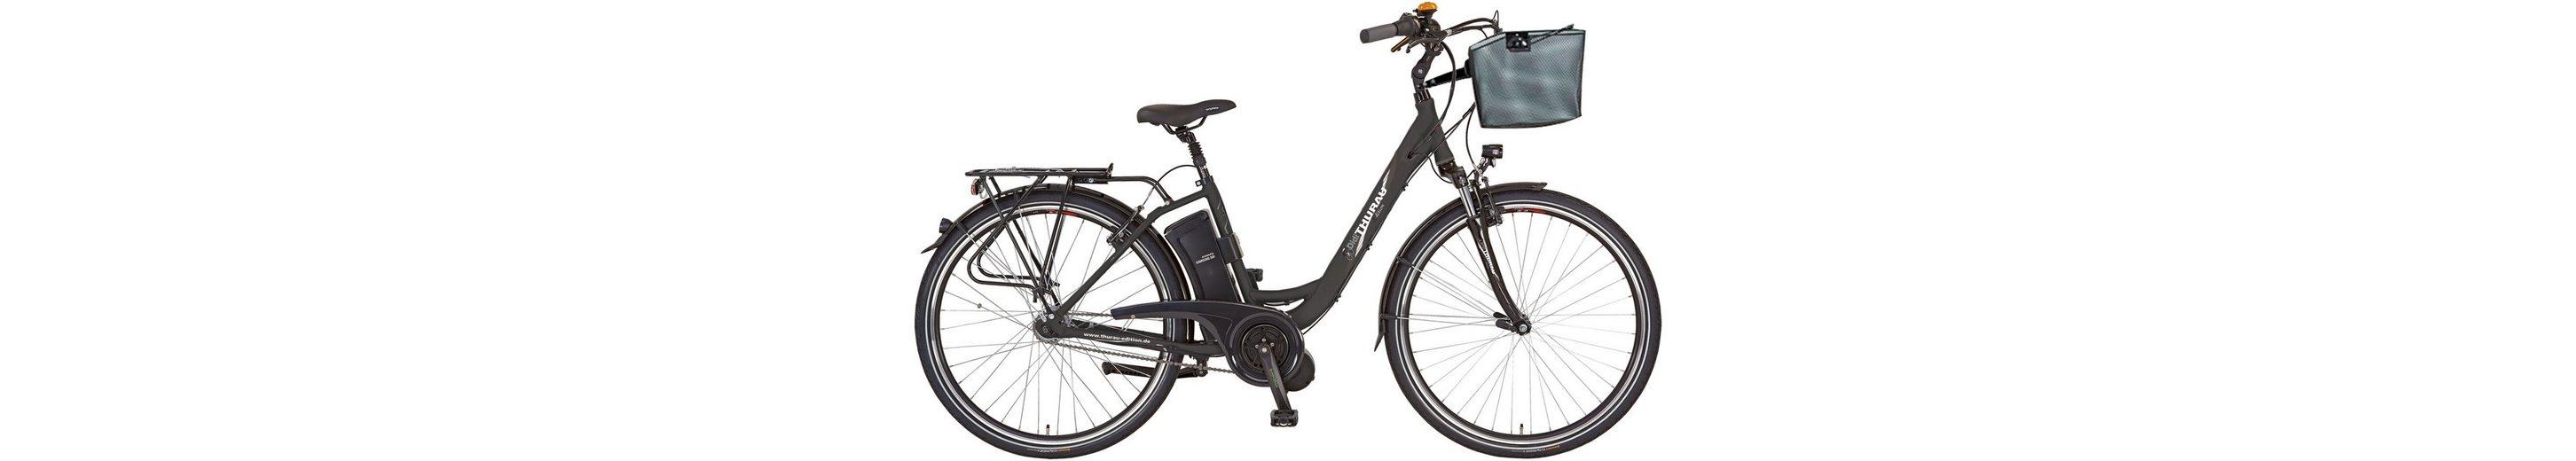 Didi Thurau Edition E-Bike, 28 Zoll, Mittelmotor, 7 Gang Shimano Nabenschaltung, »Alu-City Comfort«